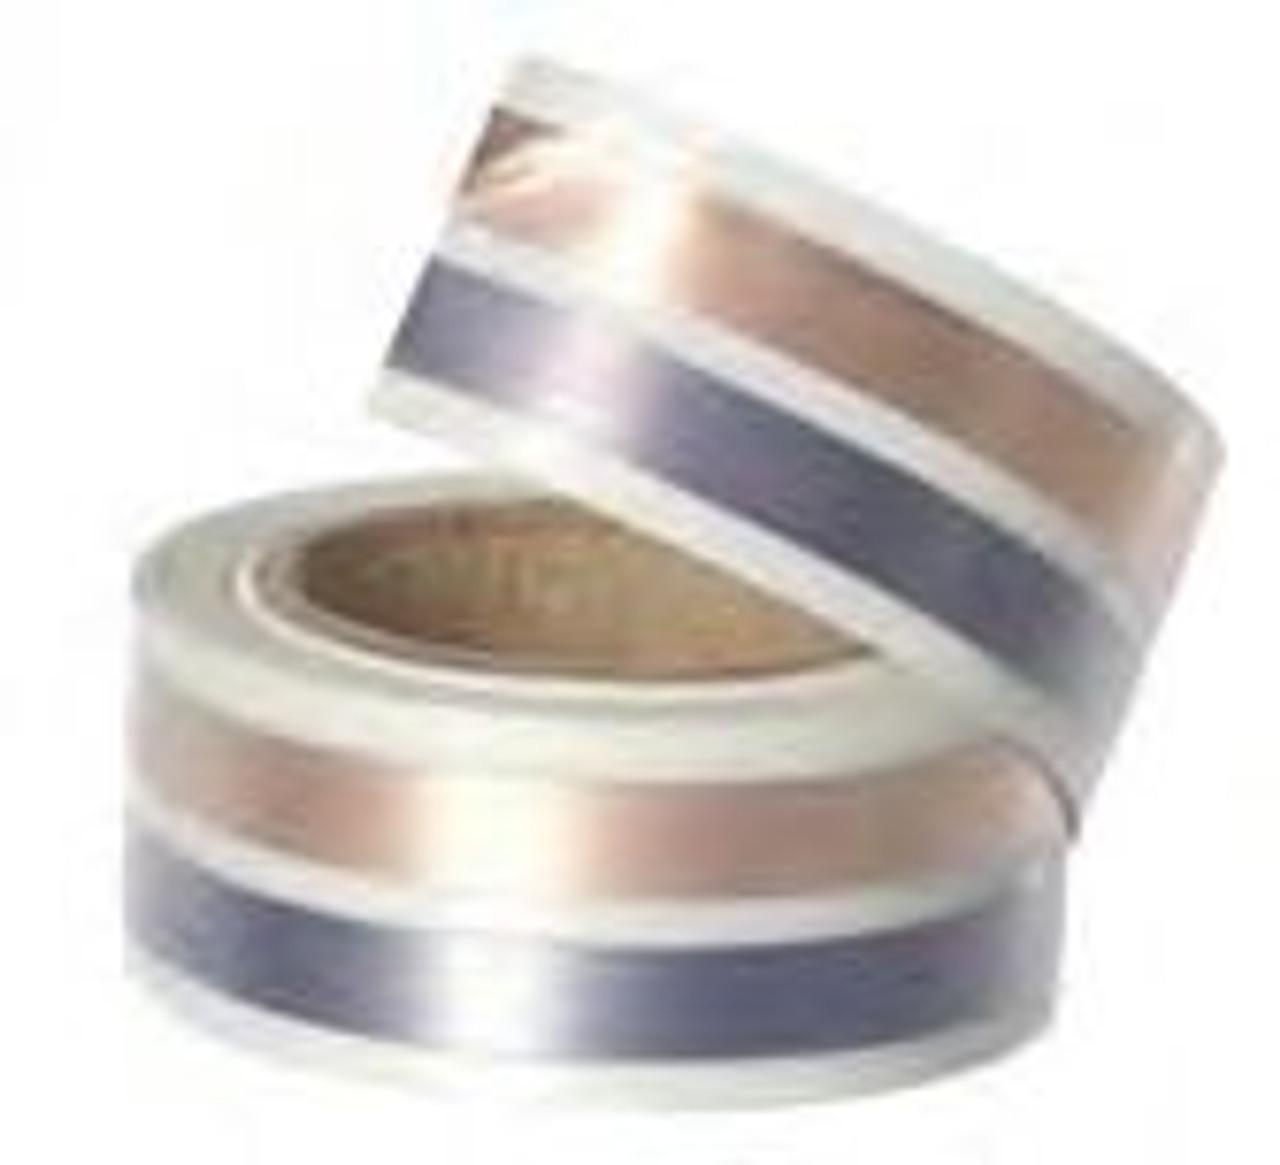 Tapewire - Roll